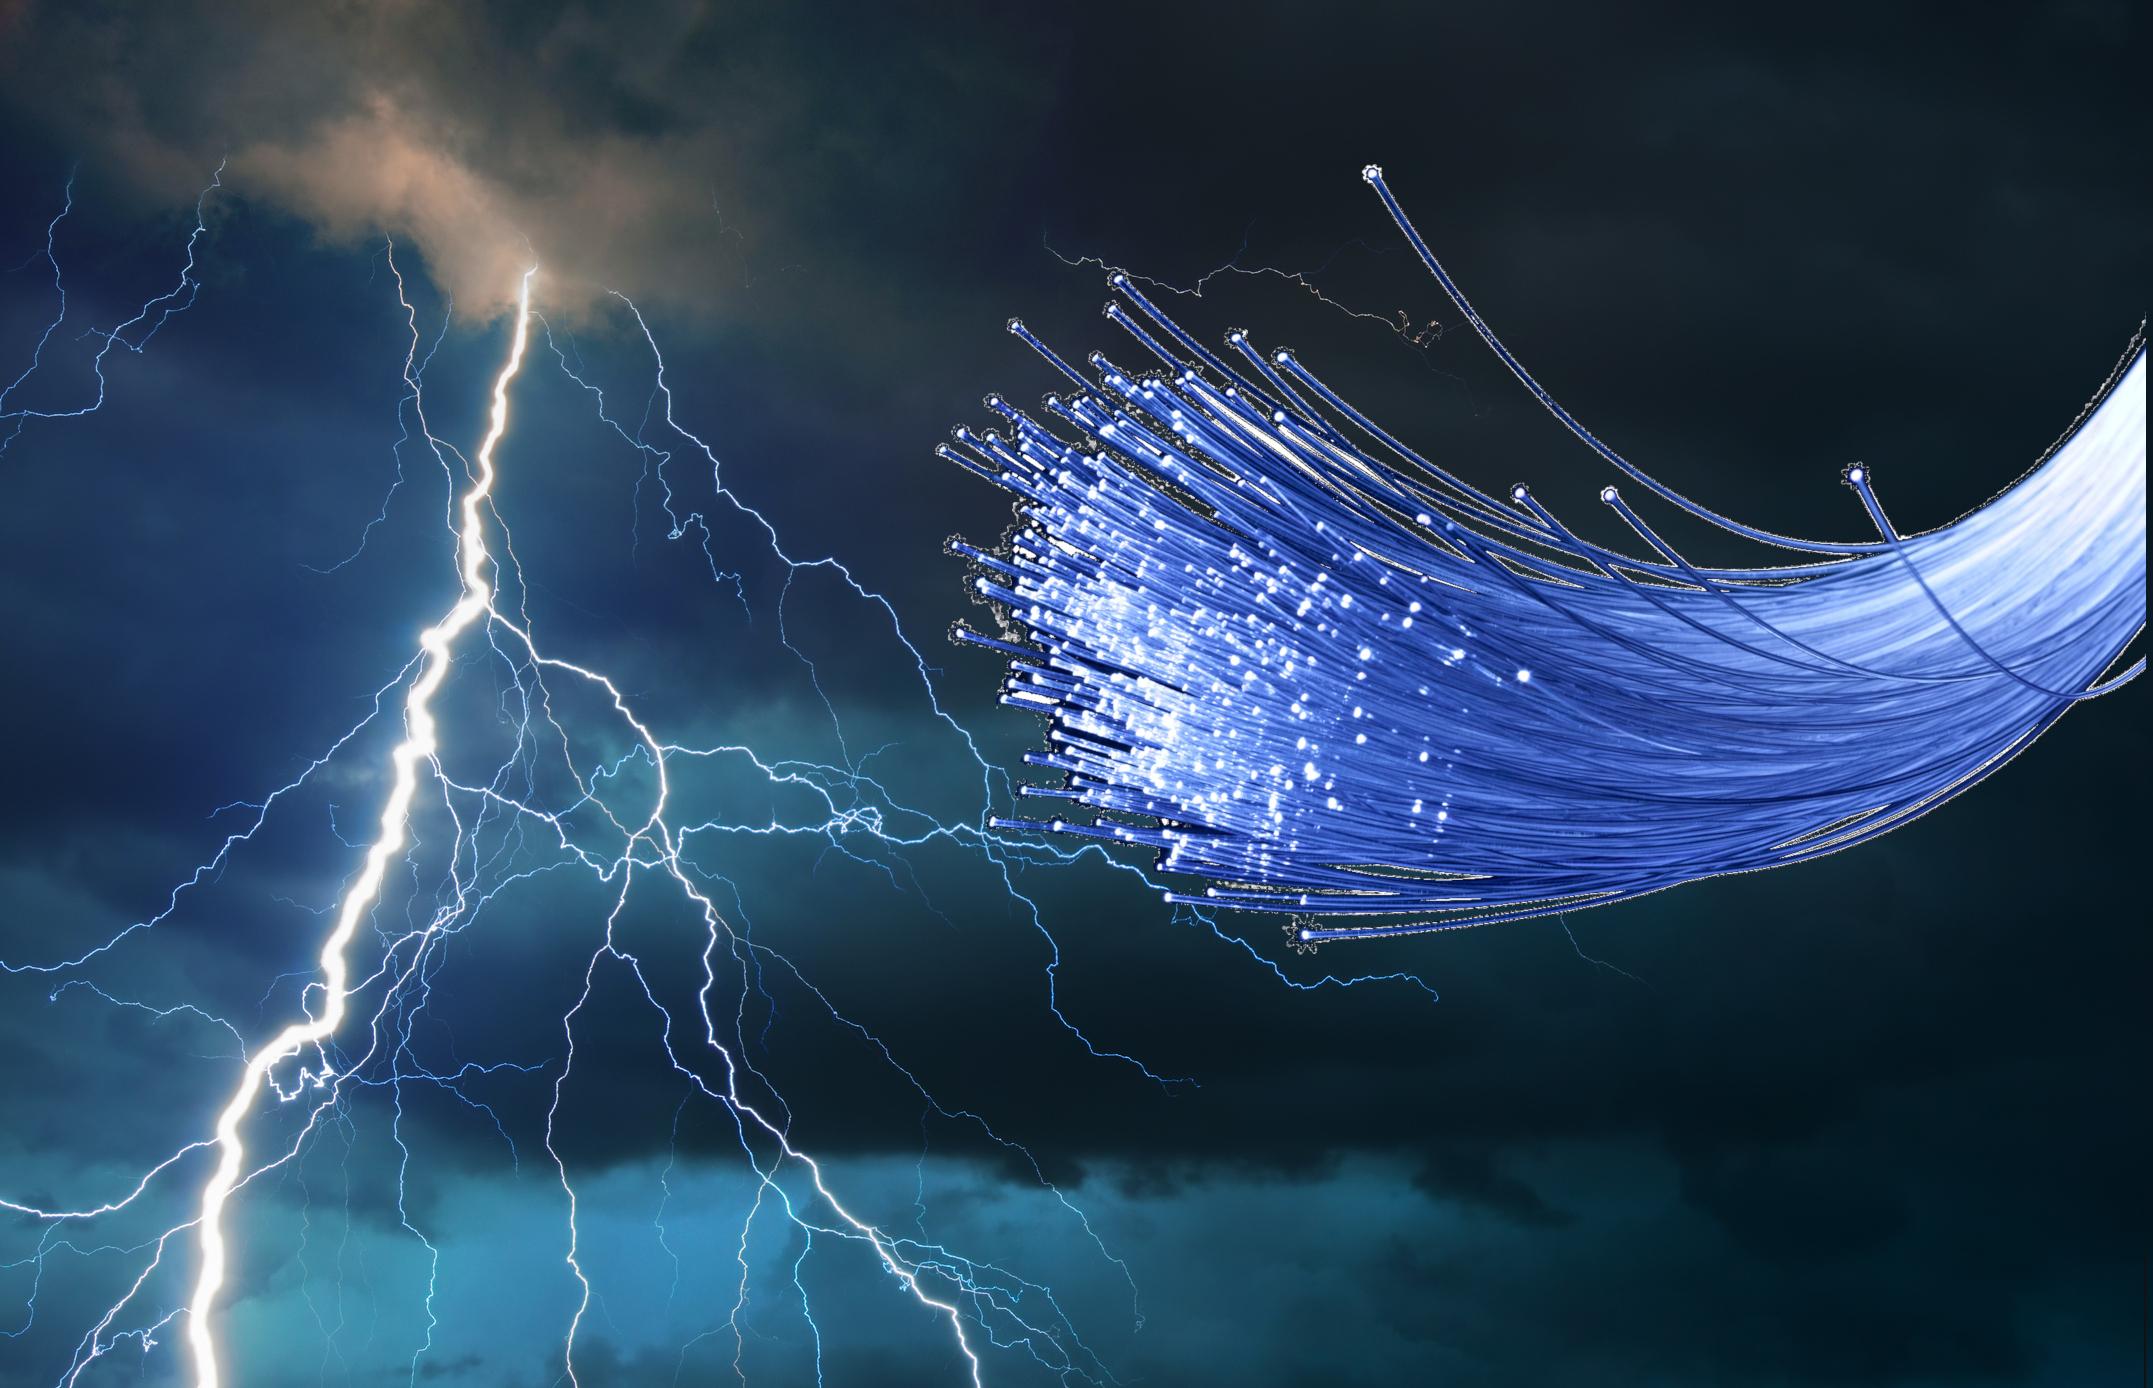 A bundle of fiber-optic wires, set against dark clouds and a lightning strike.